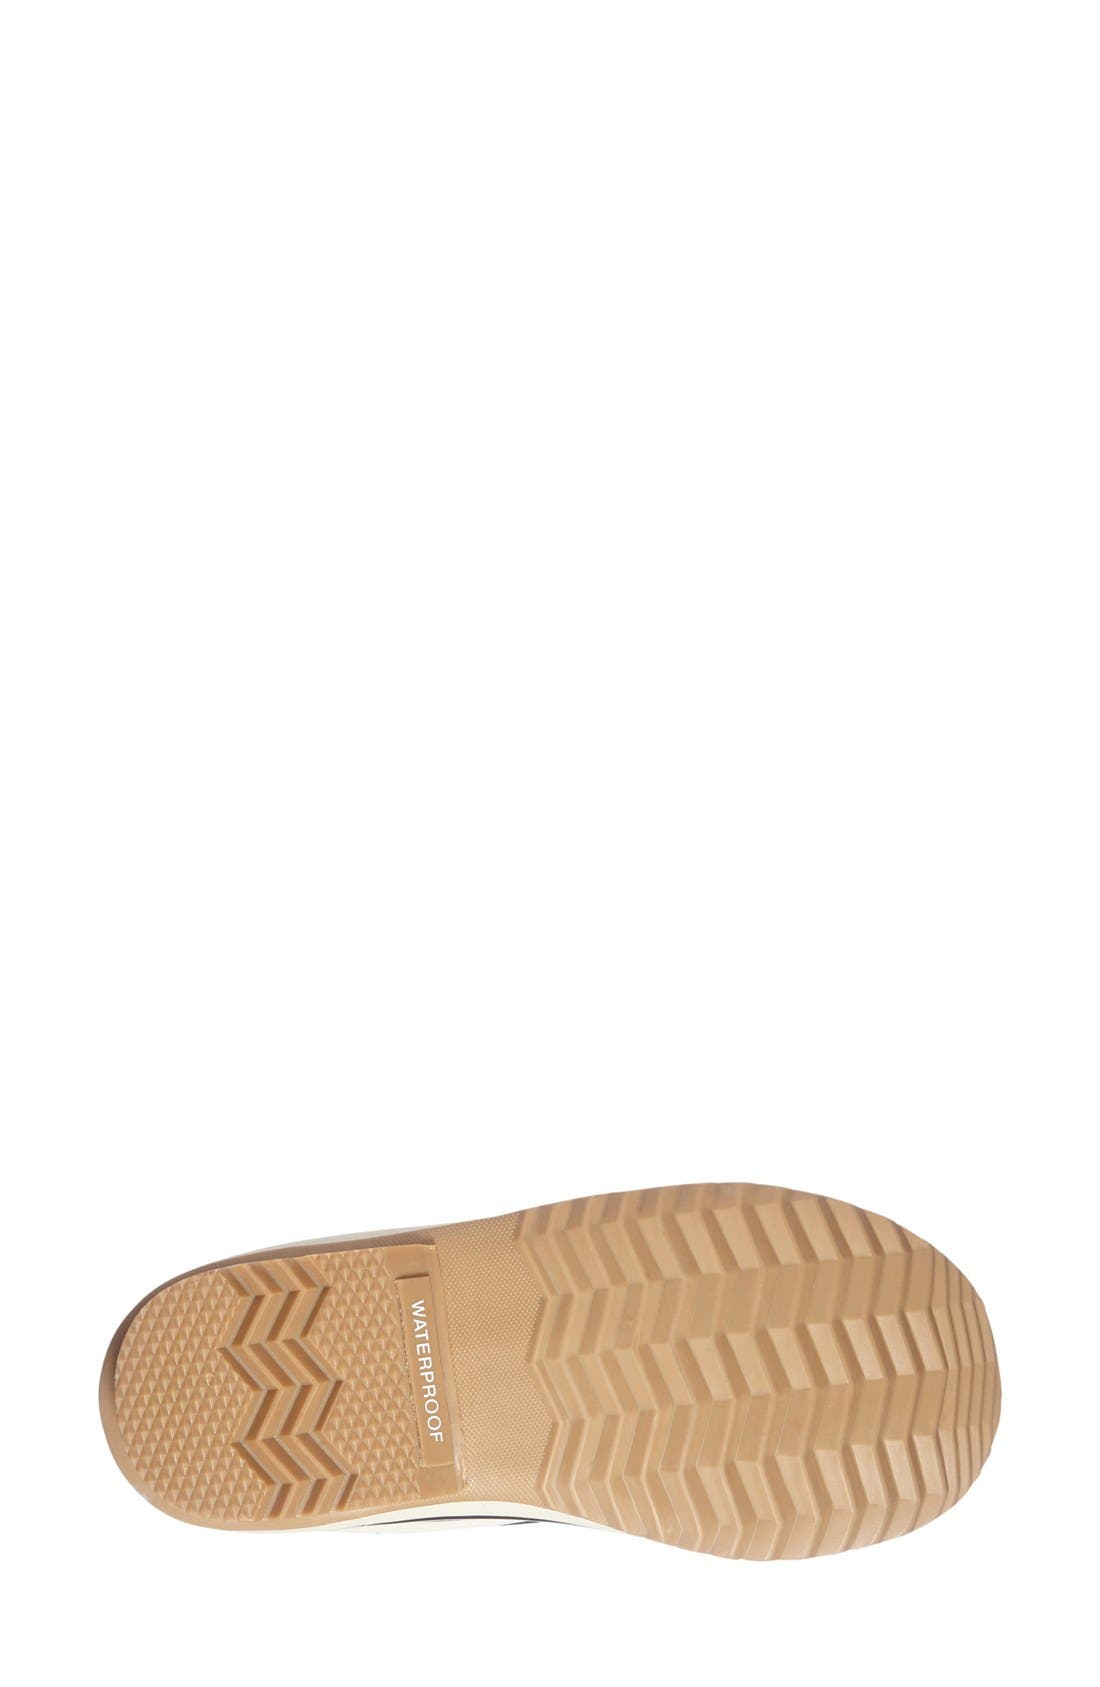 'Joan of Arctic - Knit II' Waterproof Boot,                             Alternate thumbnail 4, color,                             Black